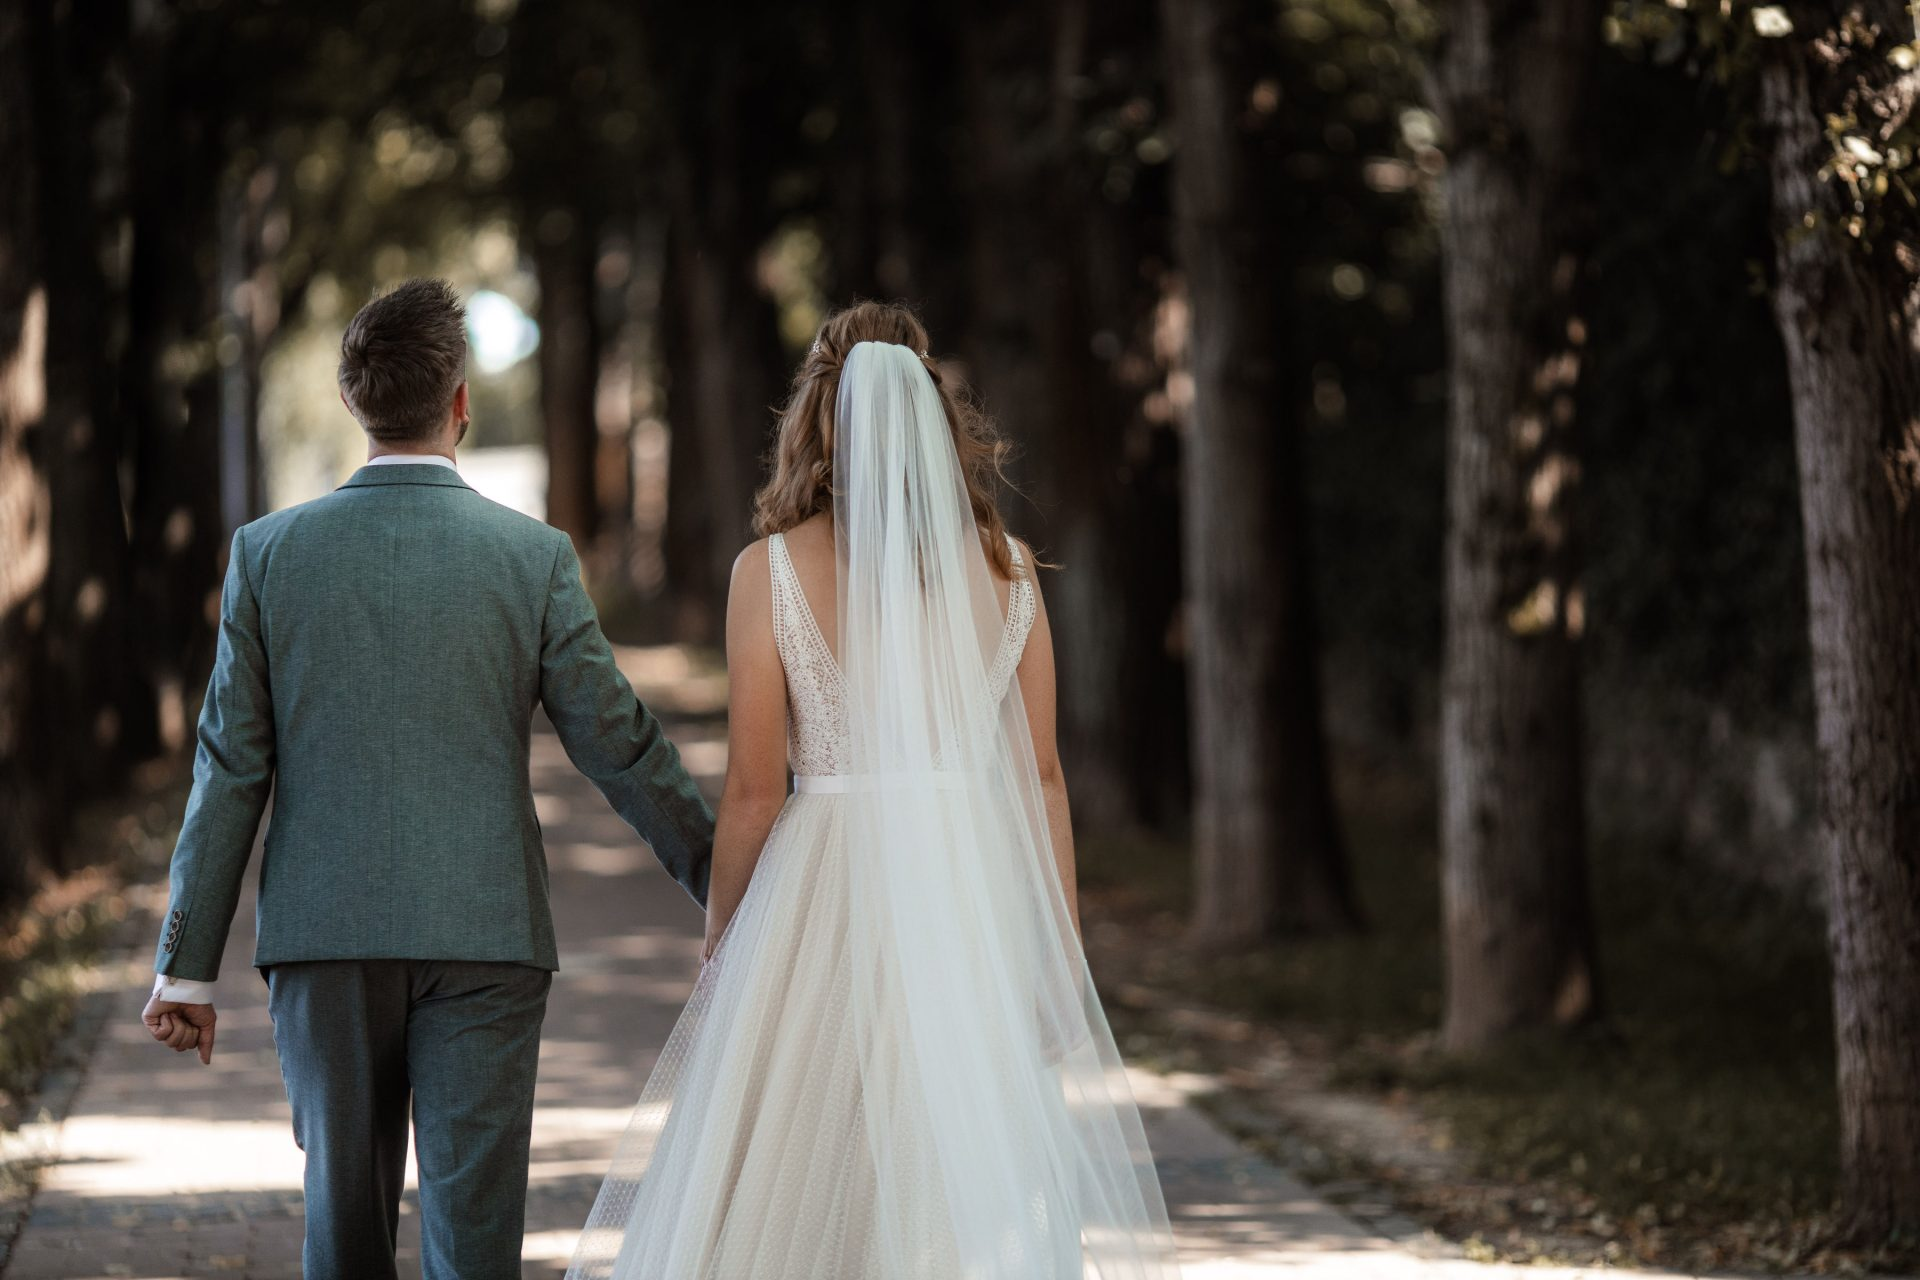 Hochzeit Weingut Kern Dominika Elasbraut Tinaundmaxim9